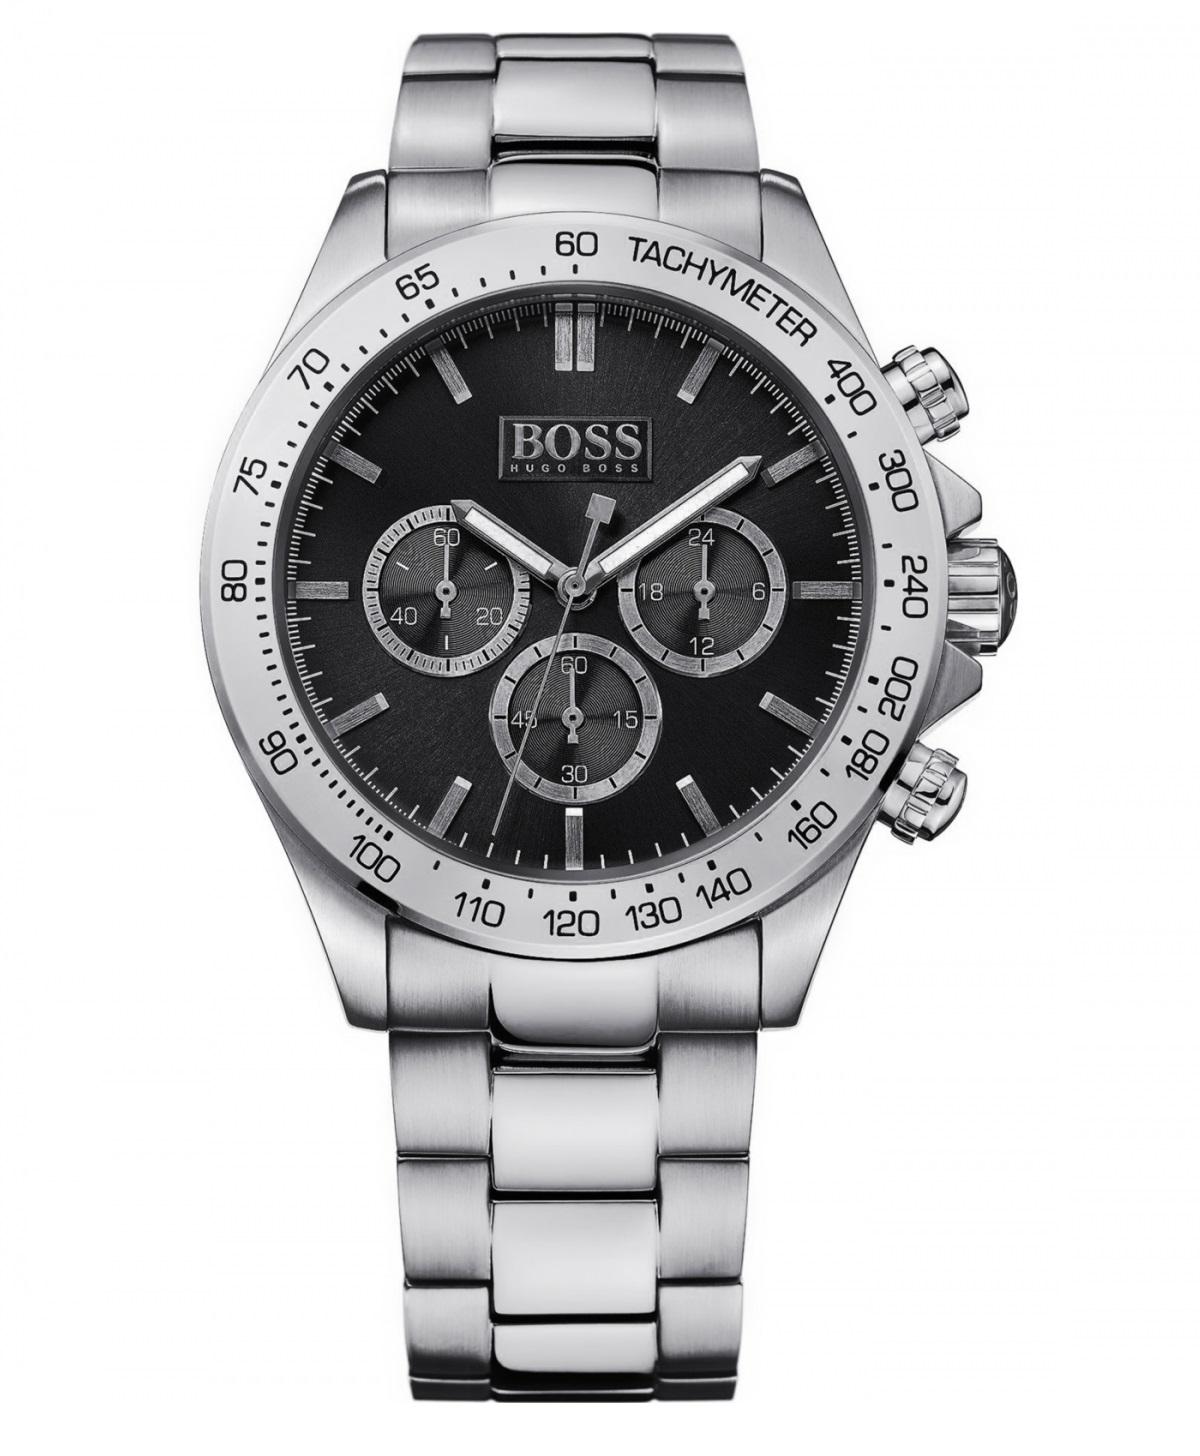 Van Fashion For Less HB1512965 Prijsvergelijk nu!